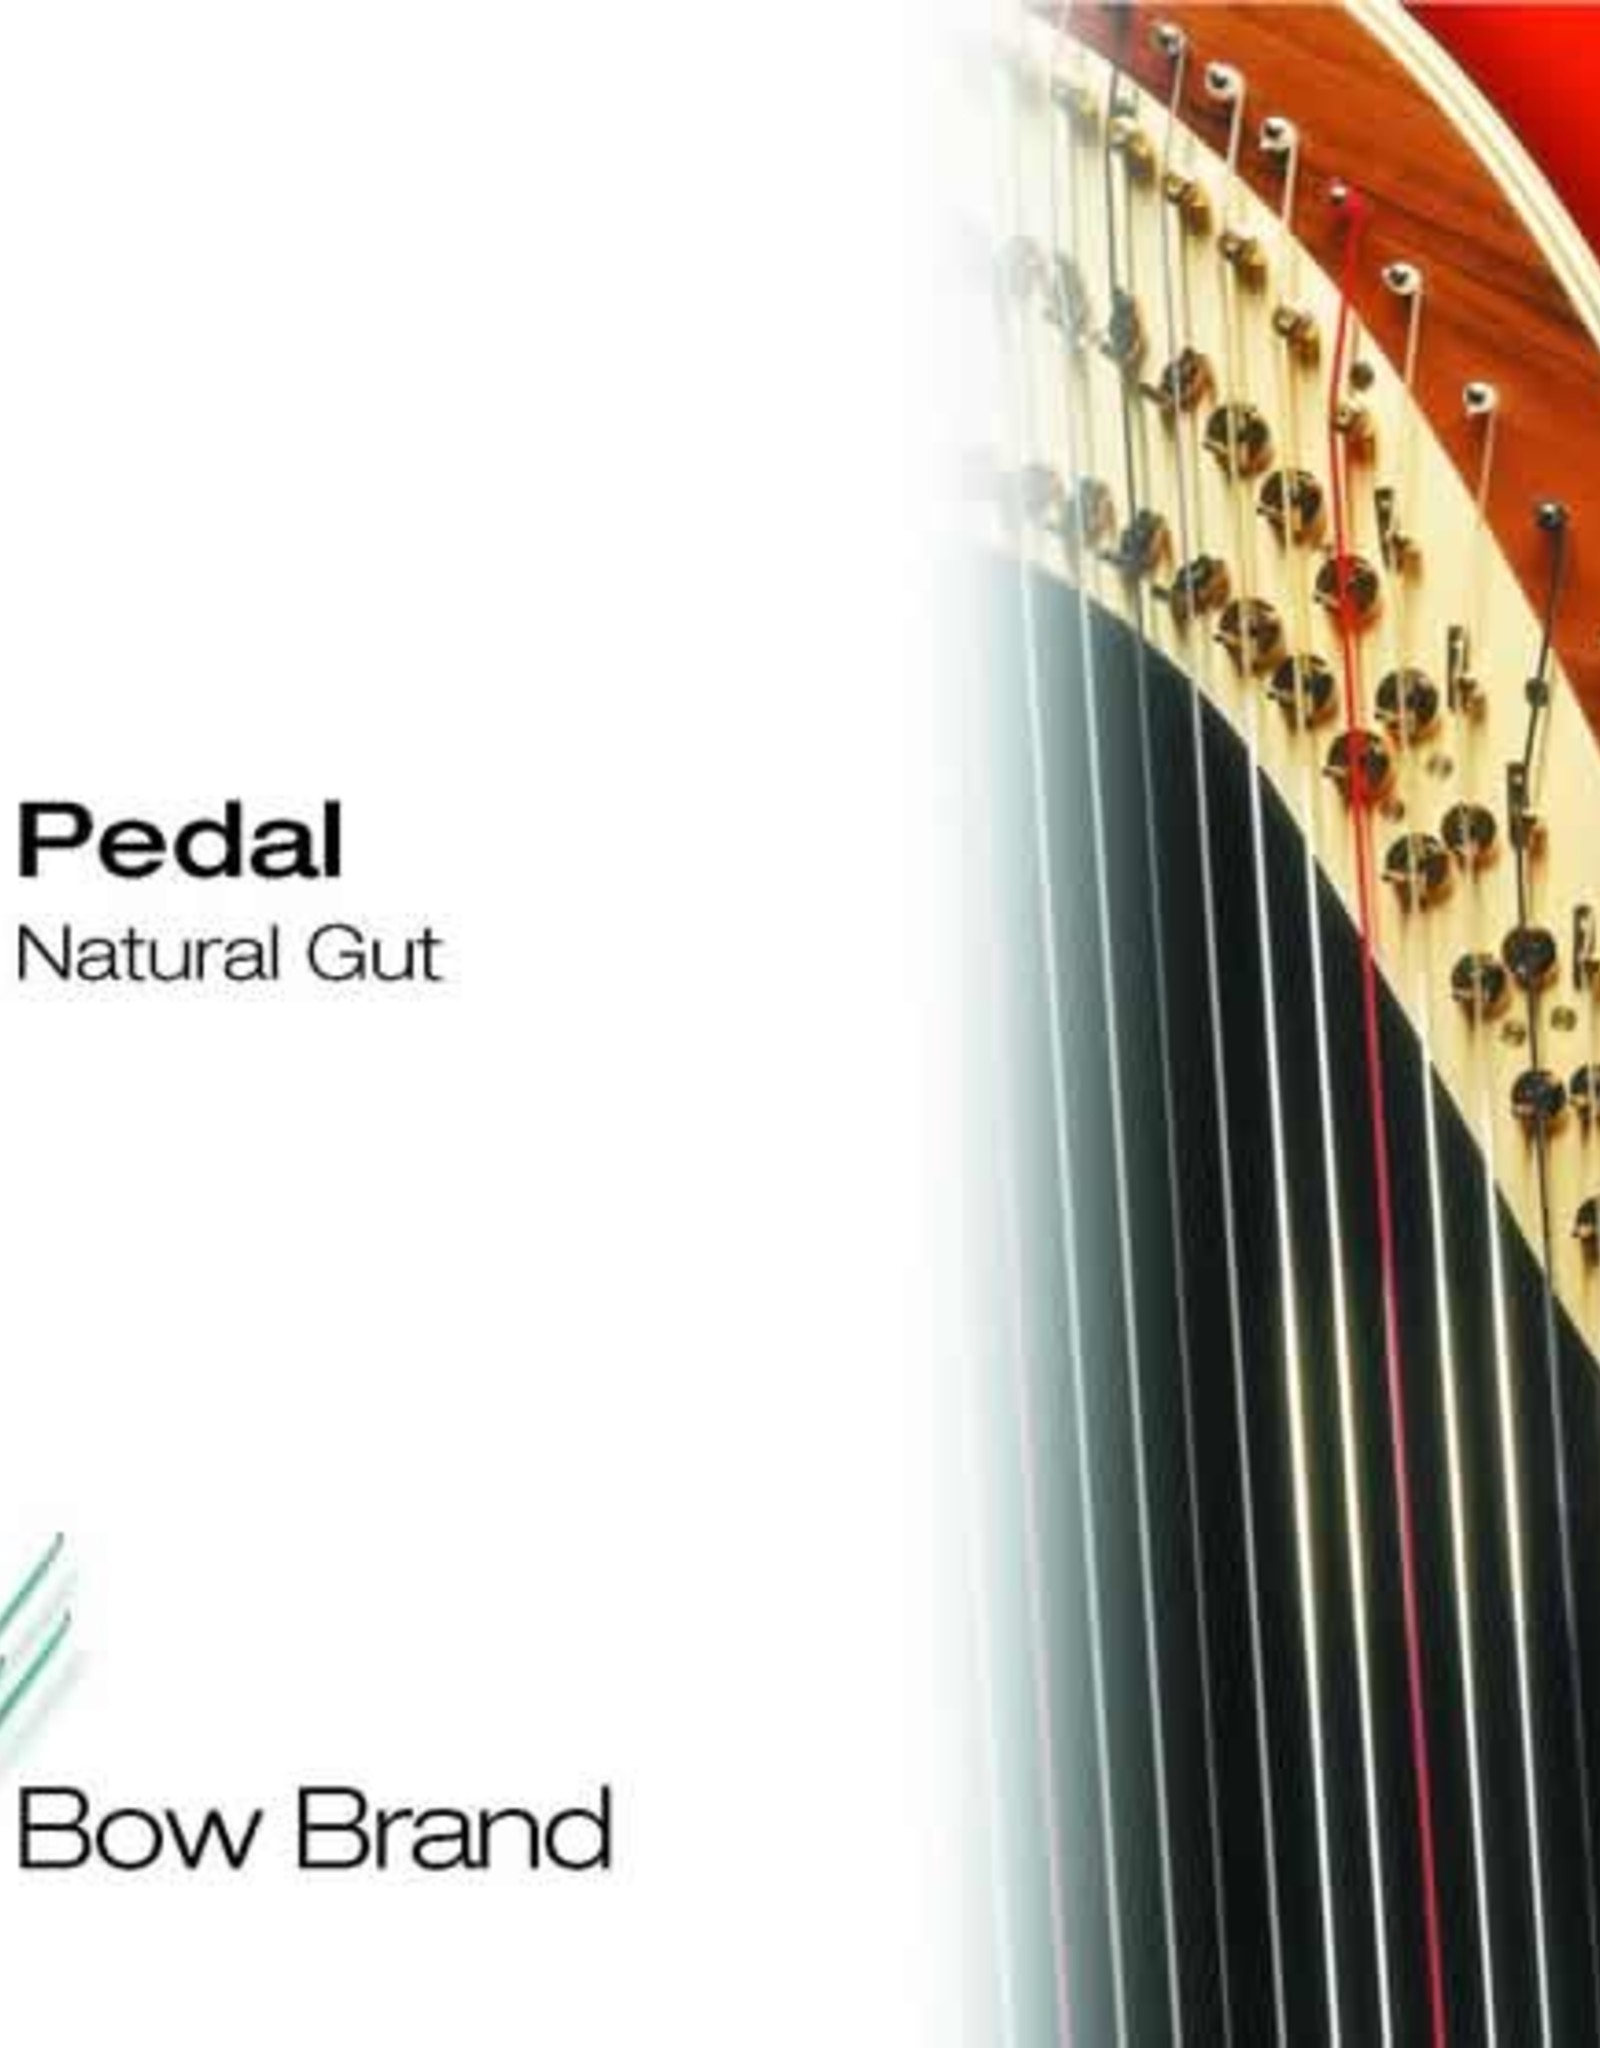 BOW BRAND  pedaal darm - pedal STD GUT 14/2 fa